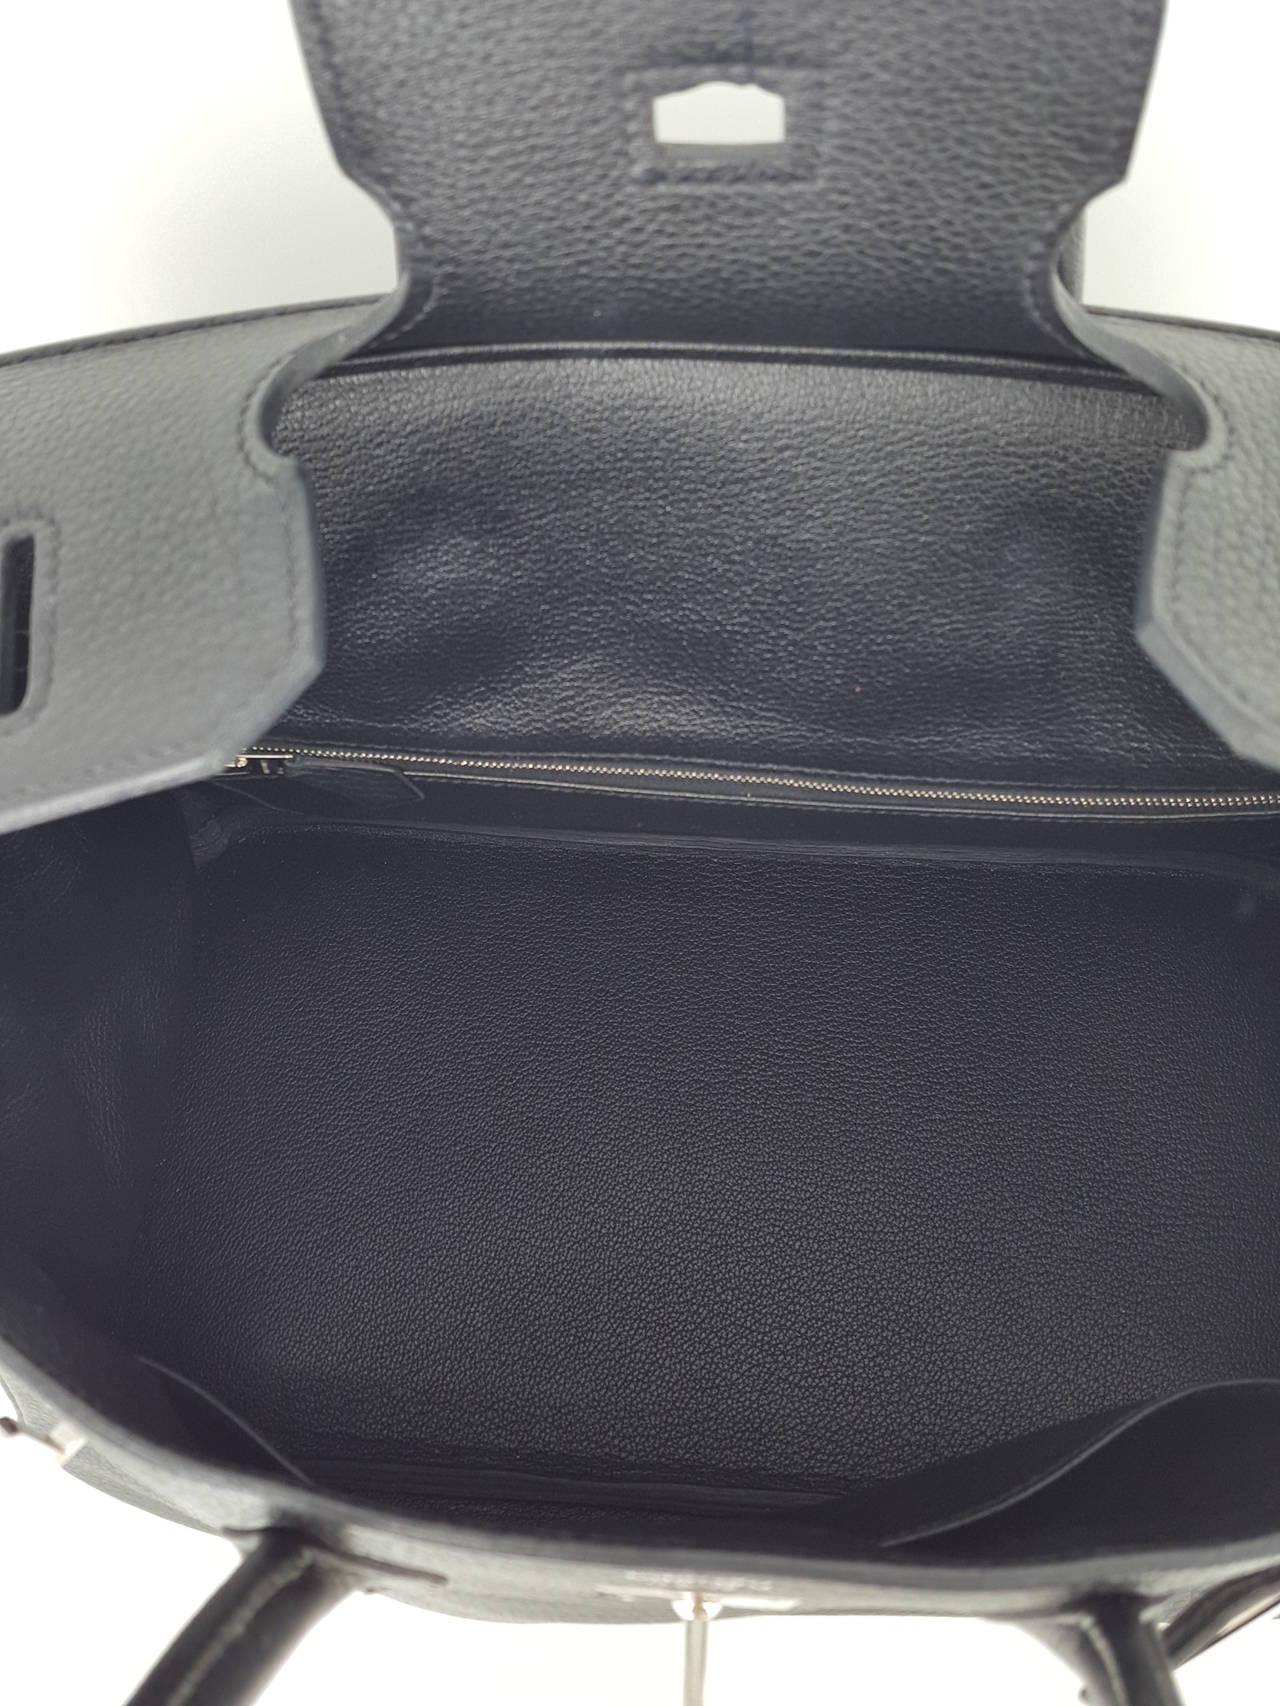 HERMES Birkin 35 CM In Black Clemence Leather With Palladium Hardware. 6